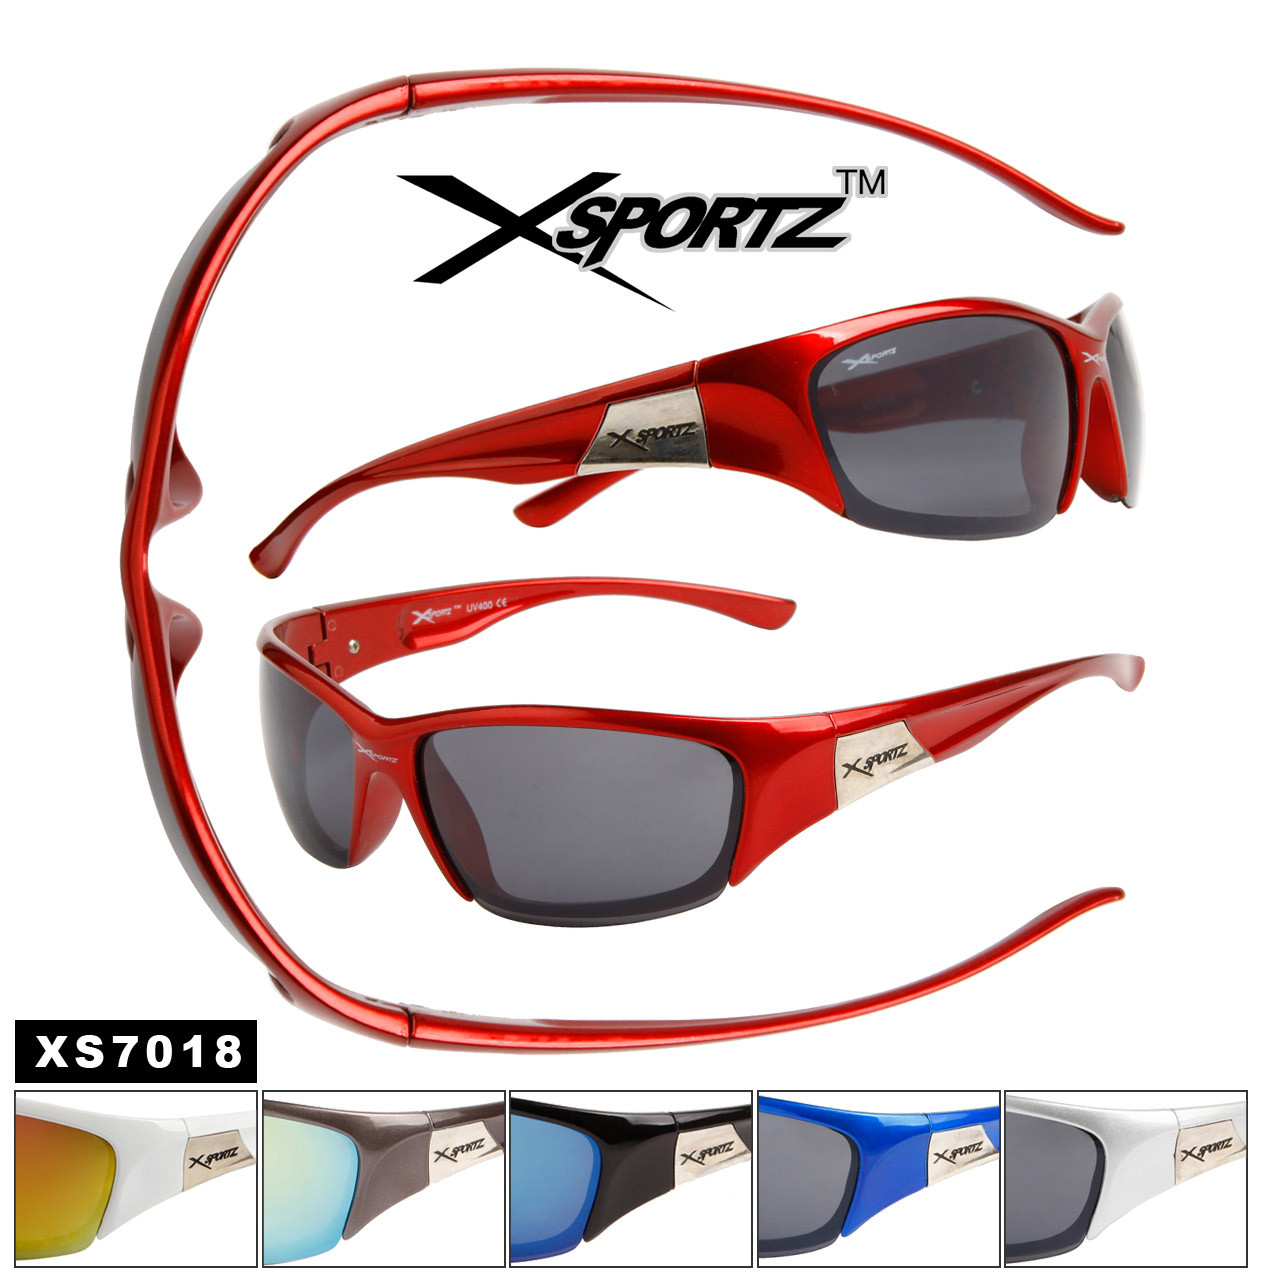 Xsportz™ Men's Sports Sunglasses Wholesale - Style # XS7018